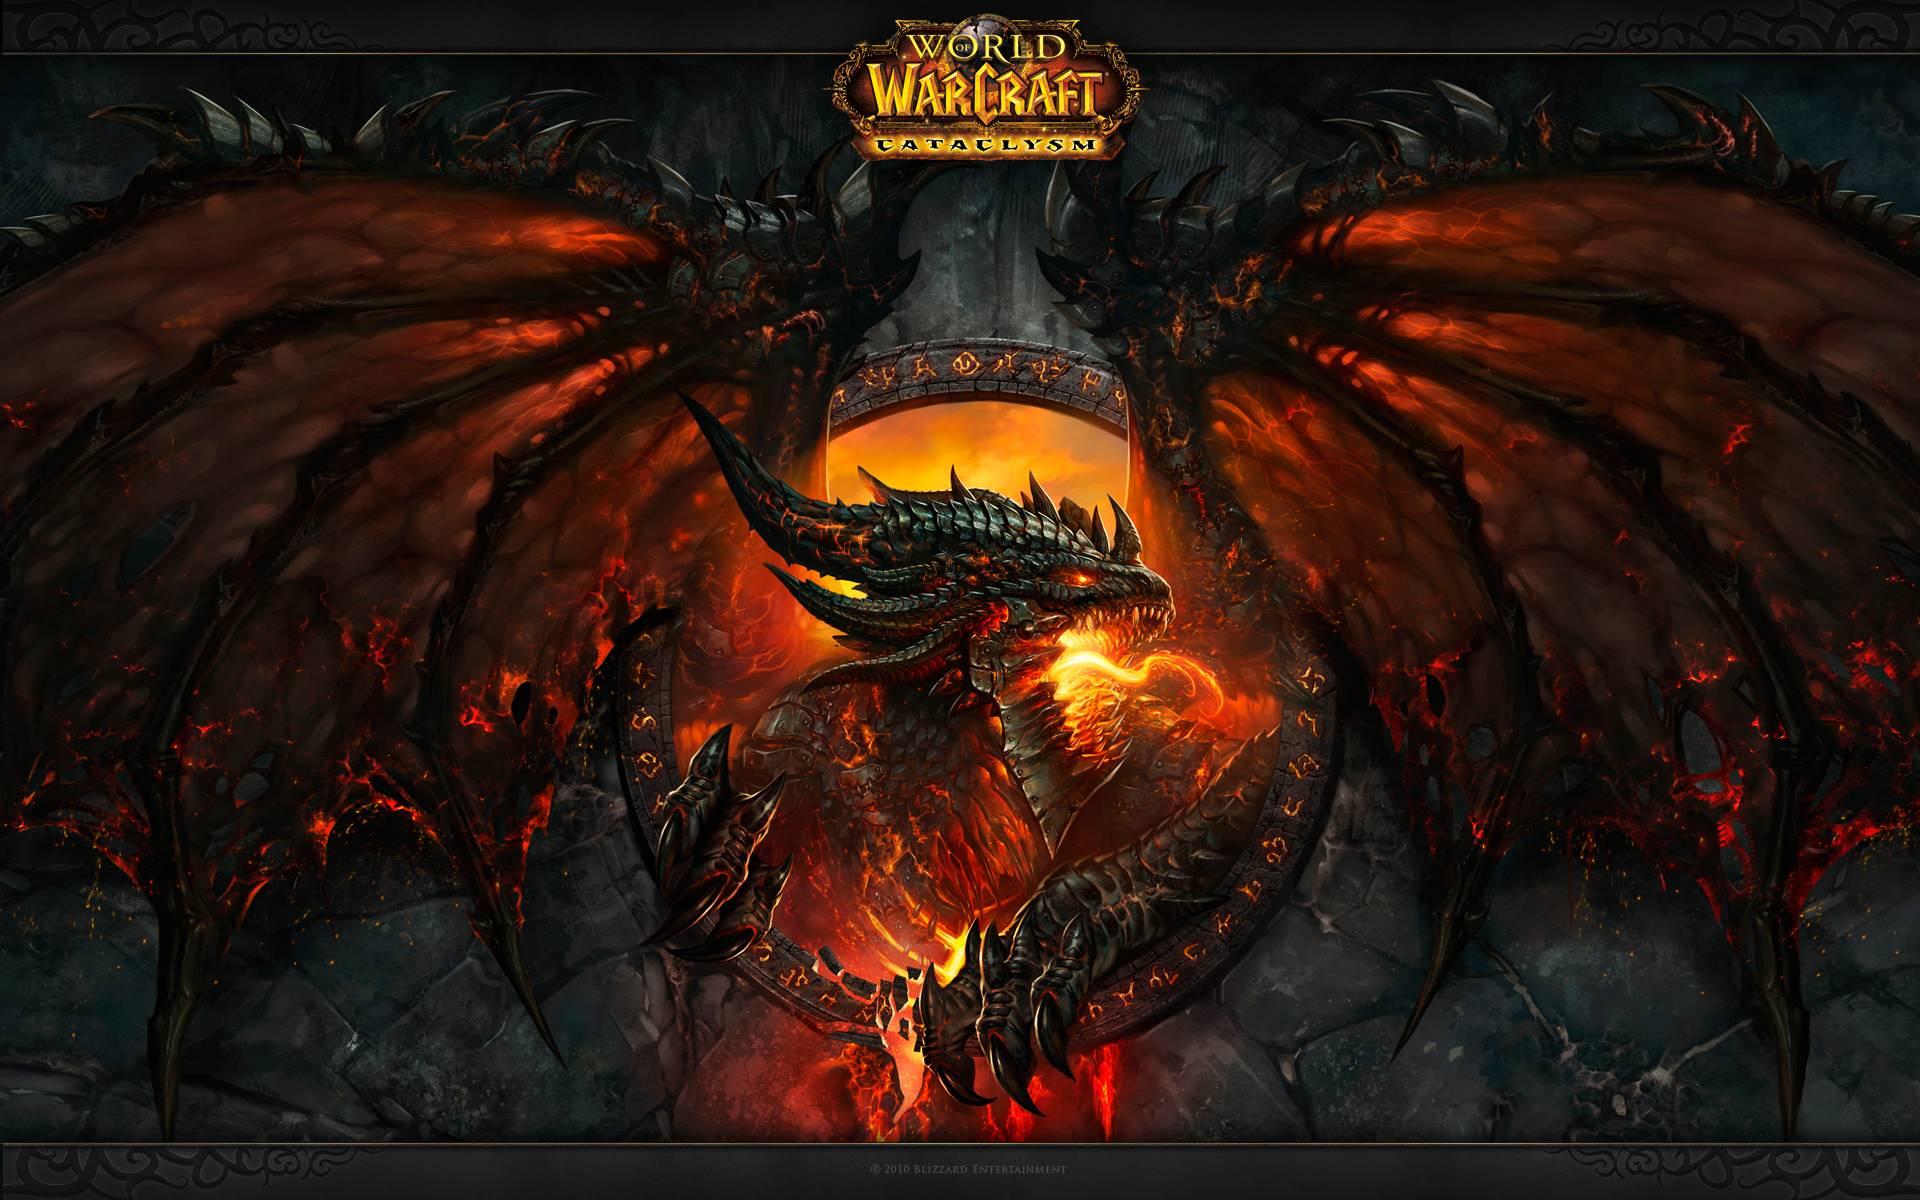 Wallpapers For > World Of Warcraft Wallpaper Alliance Vs Horde